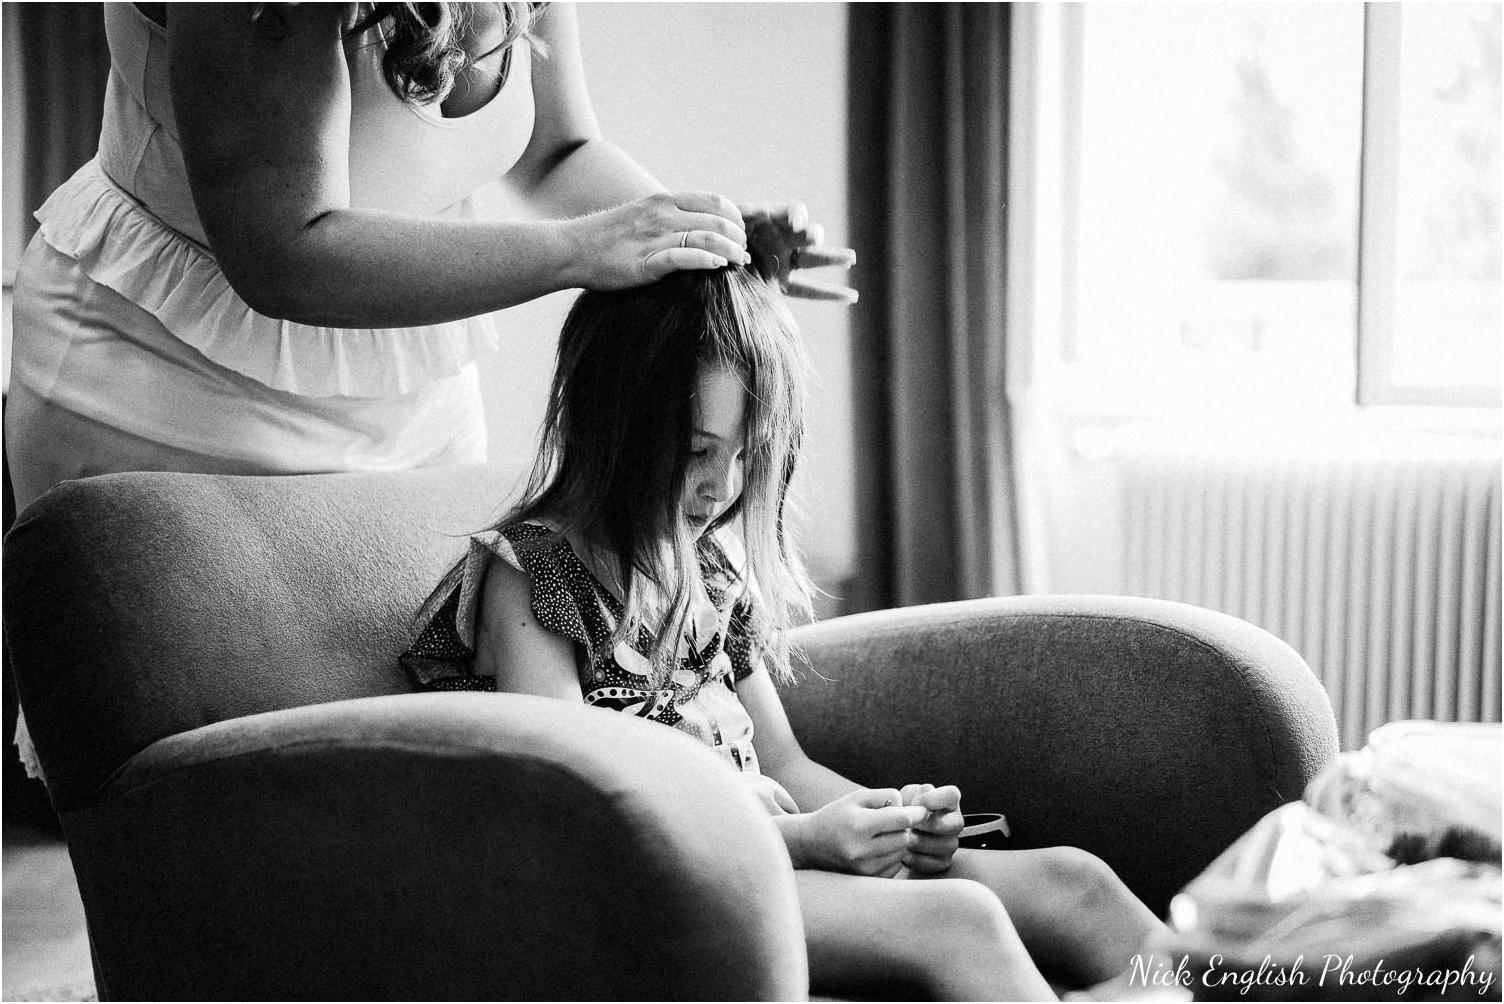 Destination_Wedding_Photographer_Slovenia_Nick_English_Photography-7.jpg